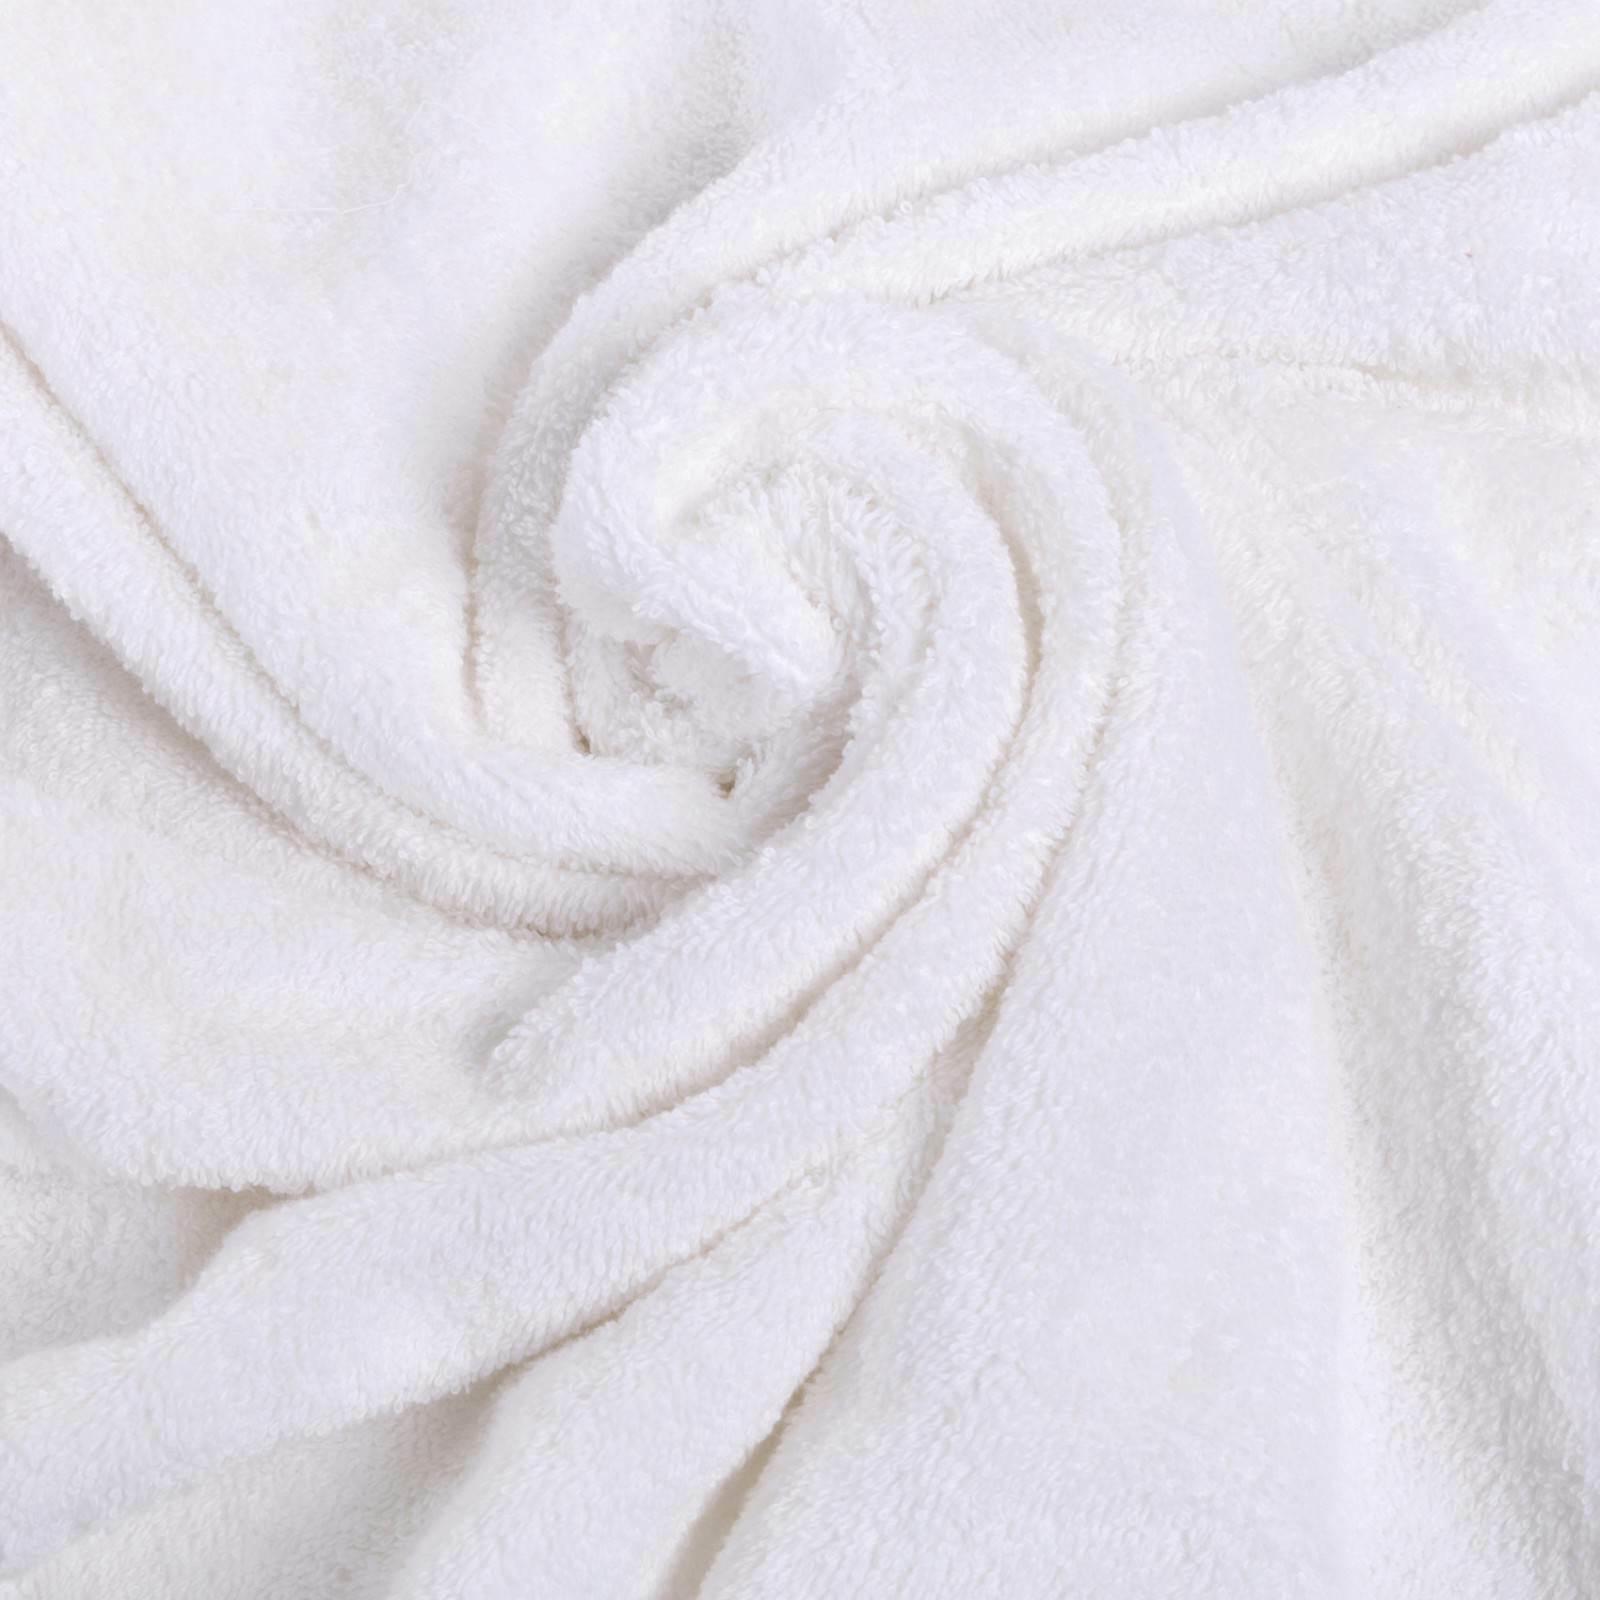 NEW WHITE SUPER TURKISH 100% COTTON HAND TOWELS